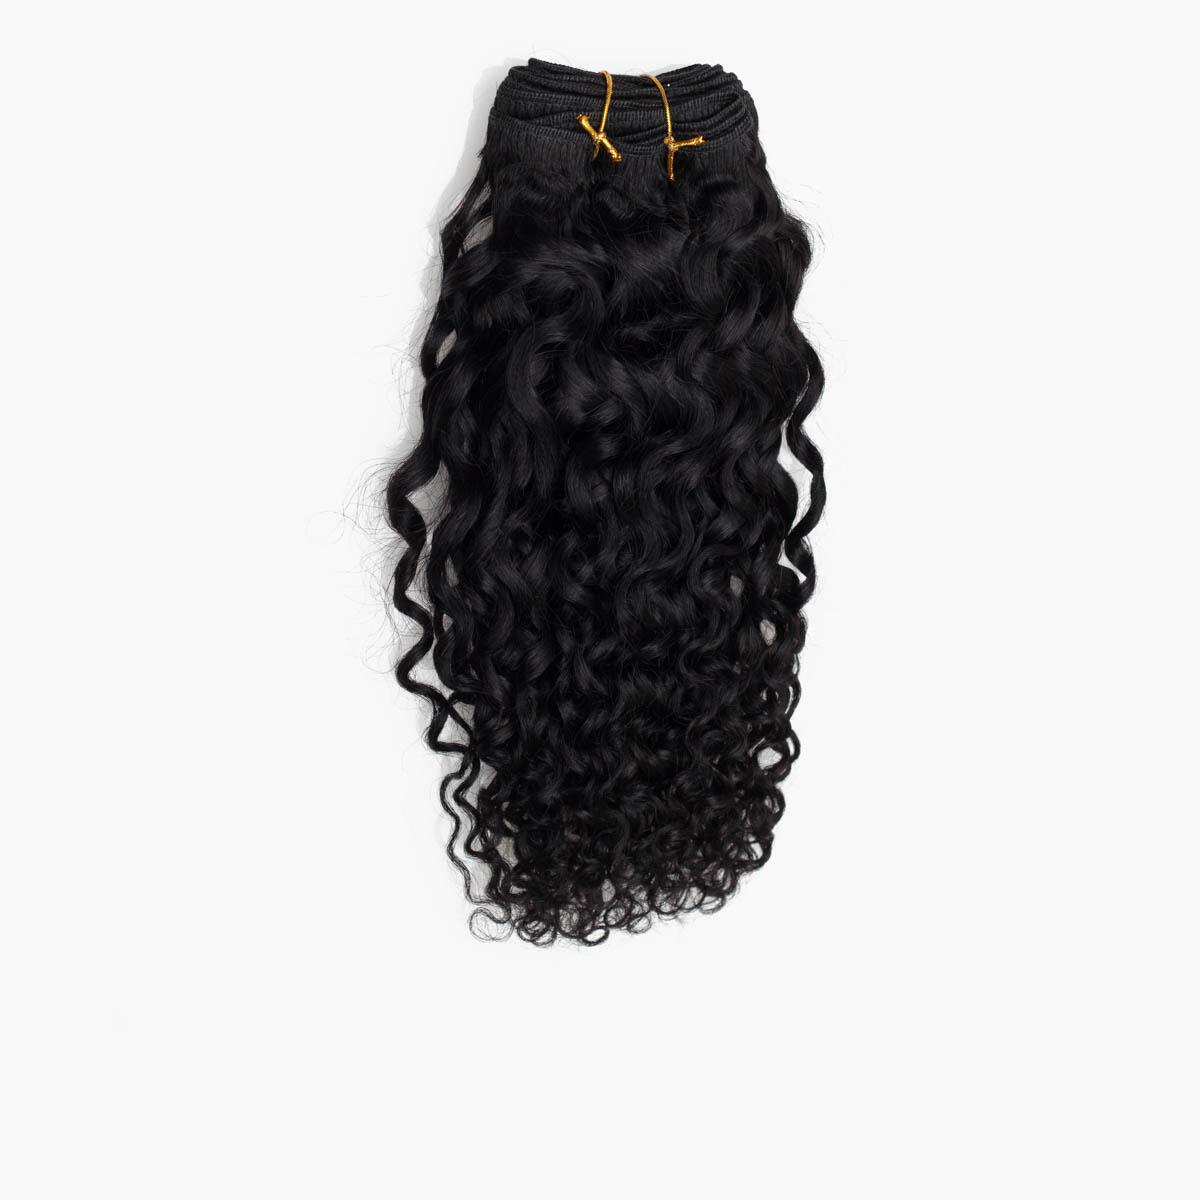 Hair Weft 1.0 Black 35 cm